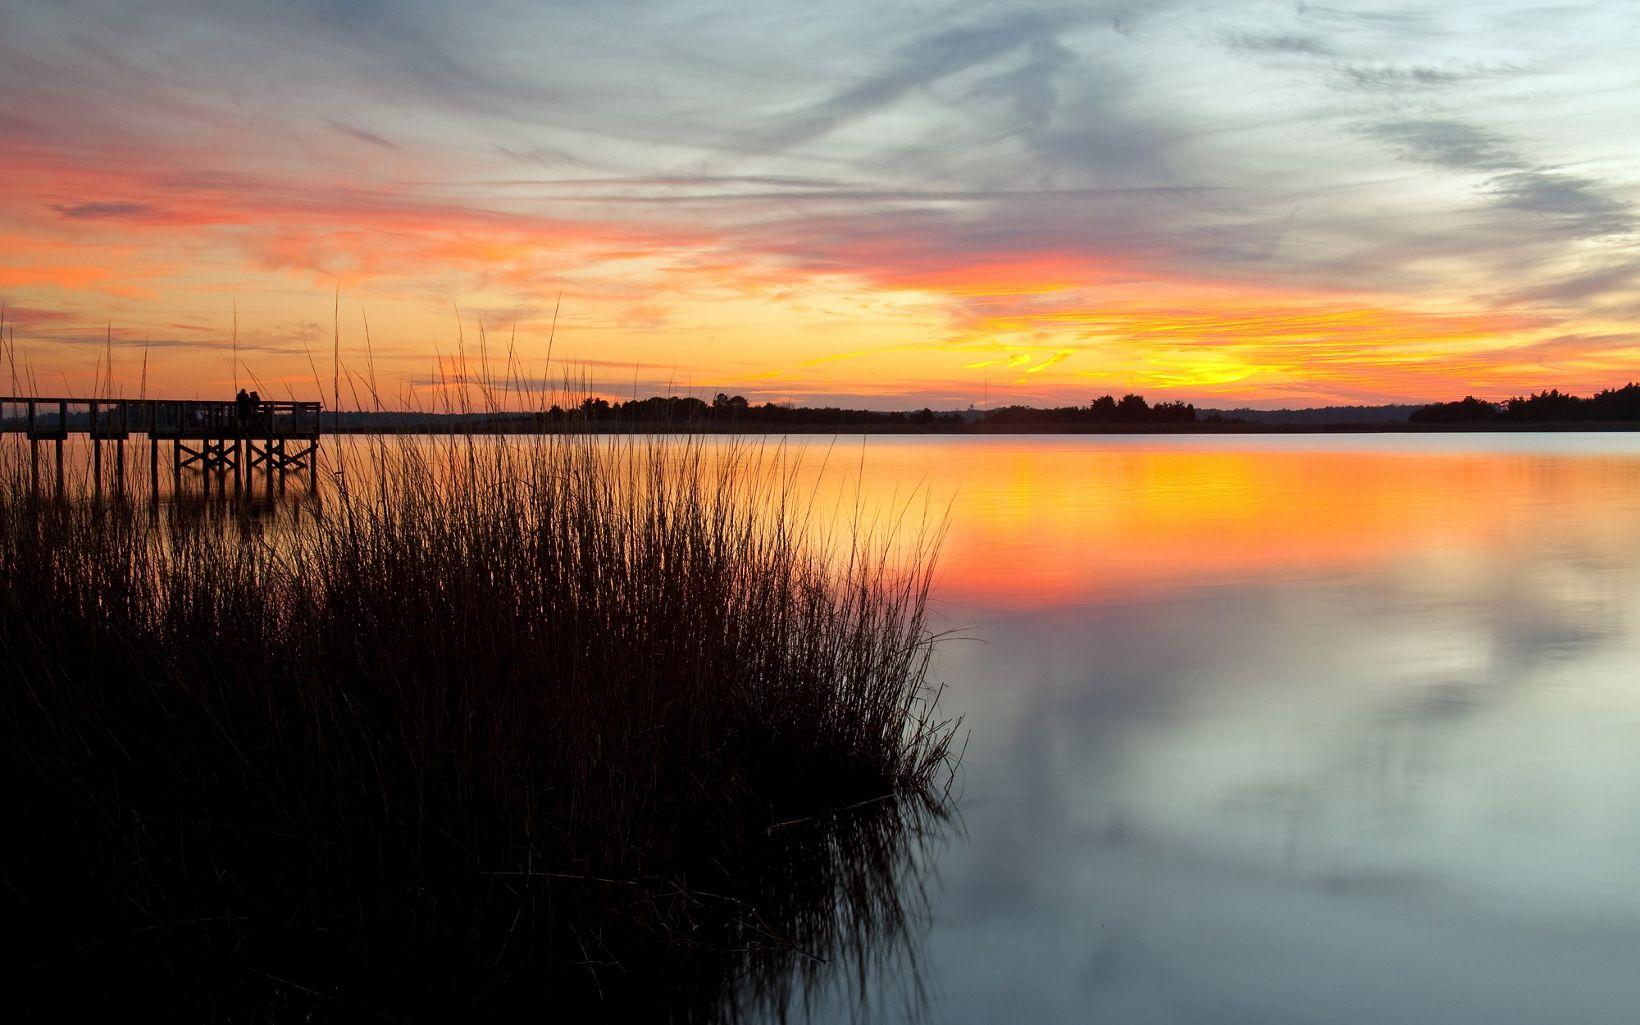 The sun setting over the Cape Fear River.